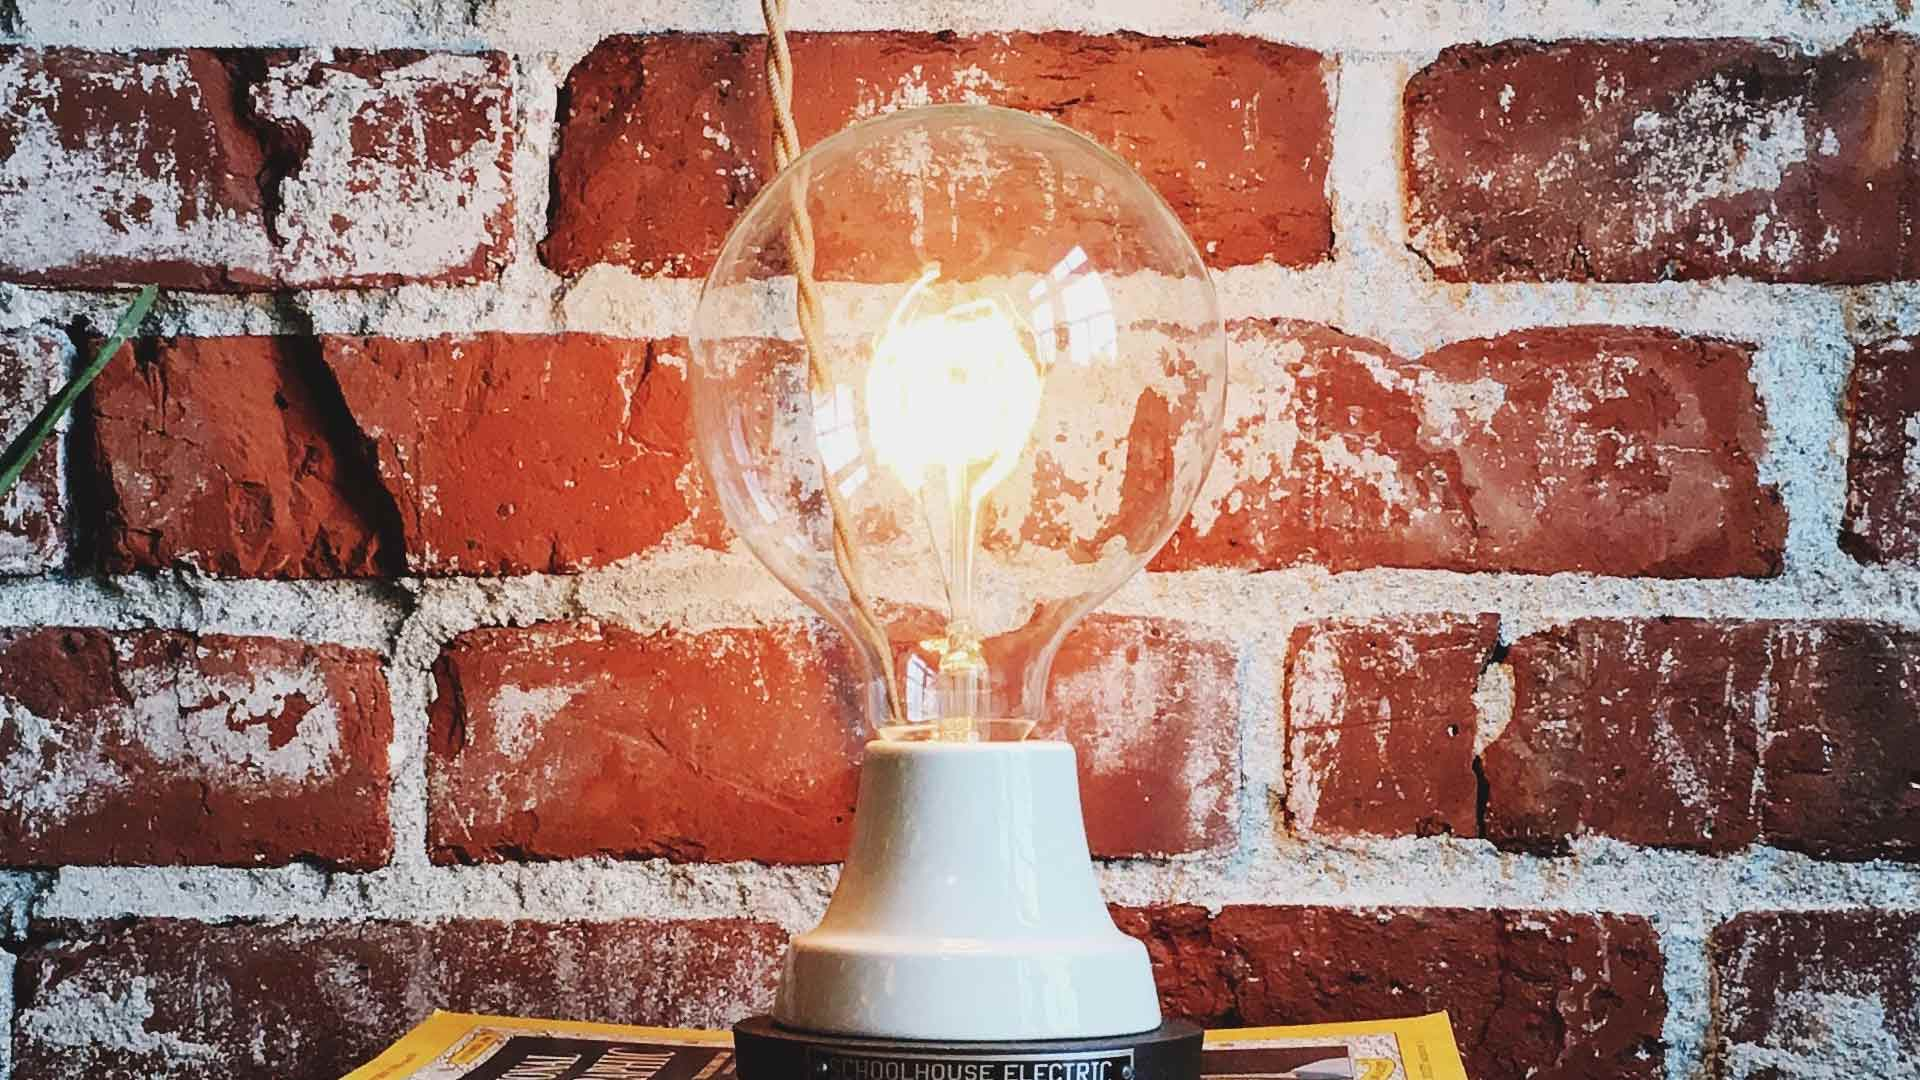 NetSuite Italia | NetSuite CRM+: un'idea vincente!